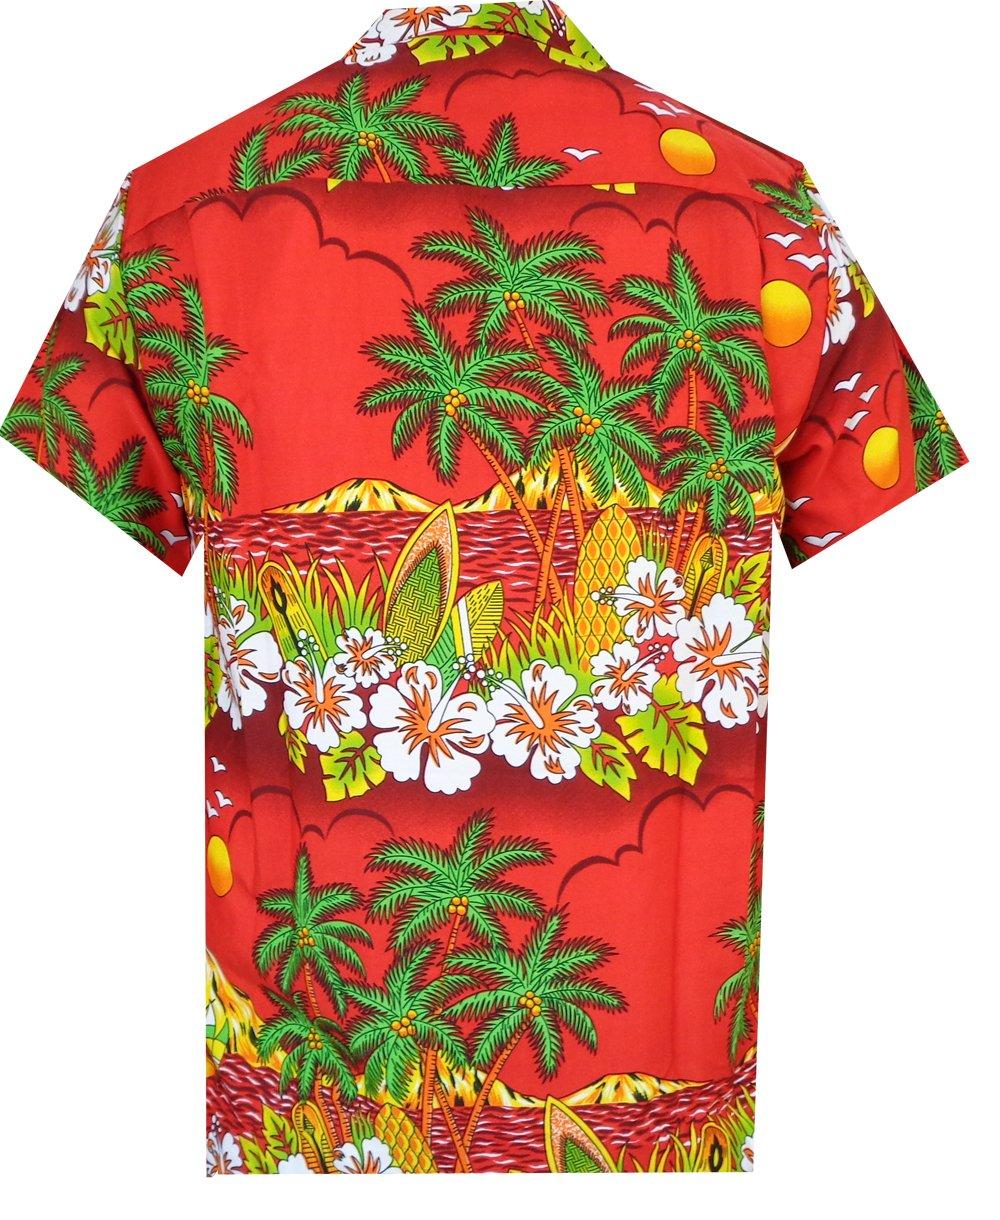 Hawaiian-Shirts-Mens-Floral-Scenic-Beach-Aloha-Party-Camp-Short-Sleeve-Holiday thumbnail 2